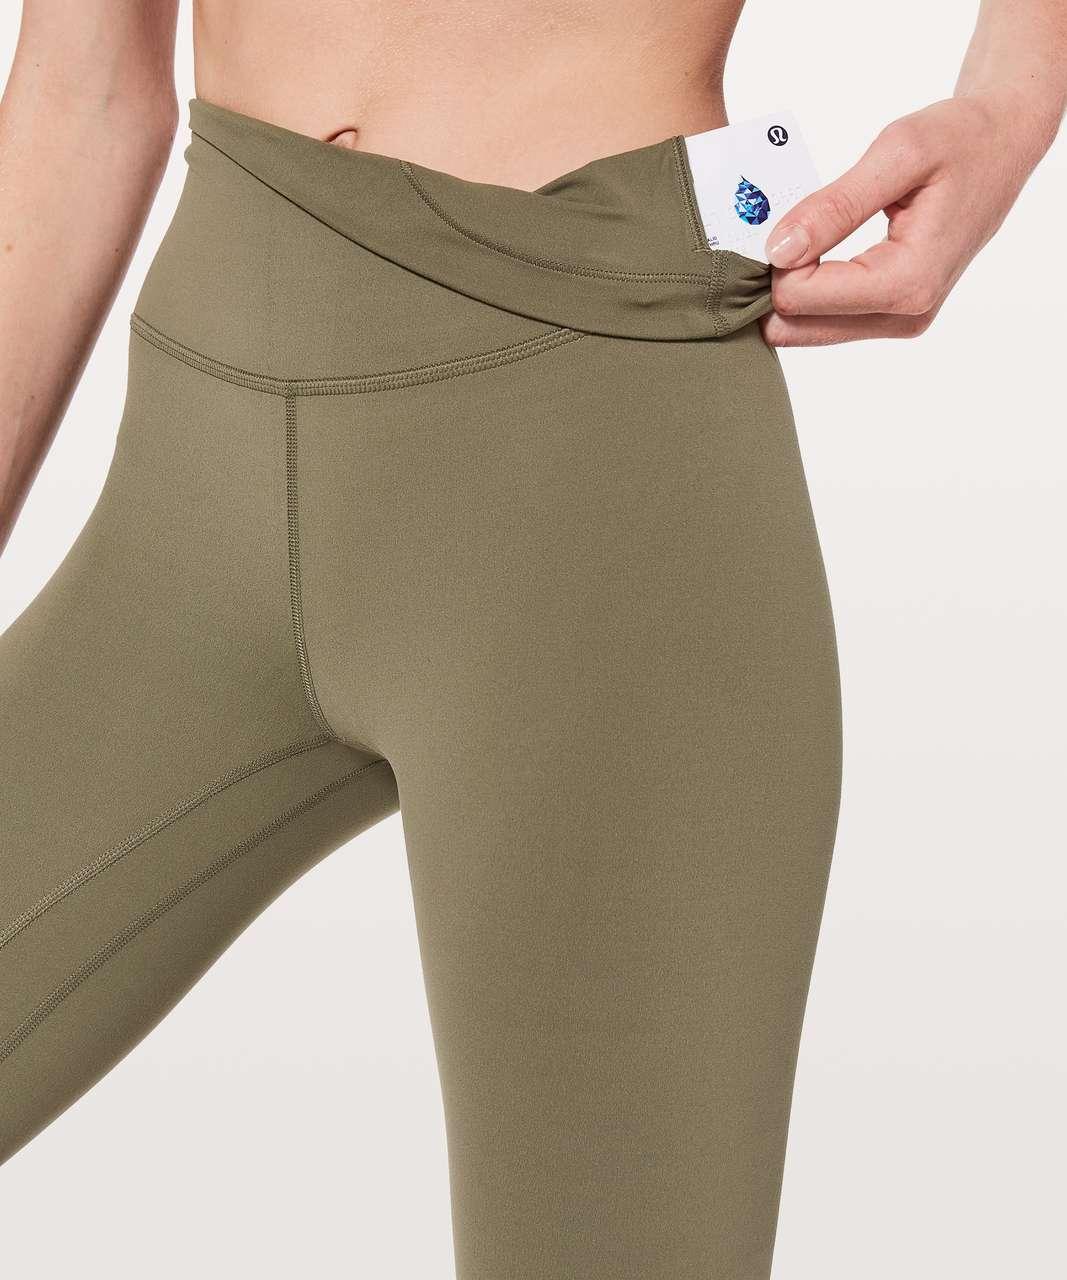 "Lululemon Align Pant *Full Length 28"" - Sage"